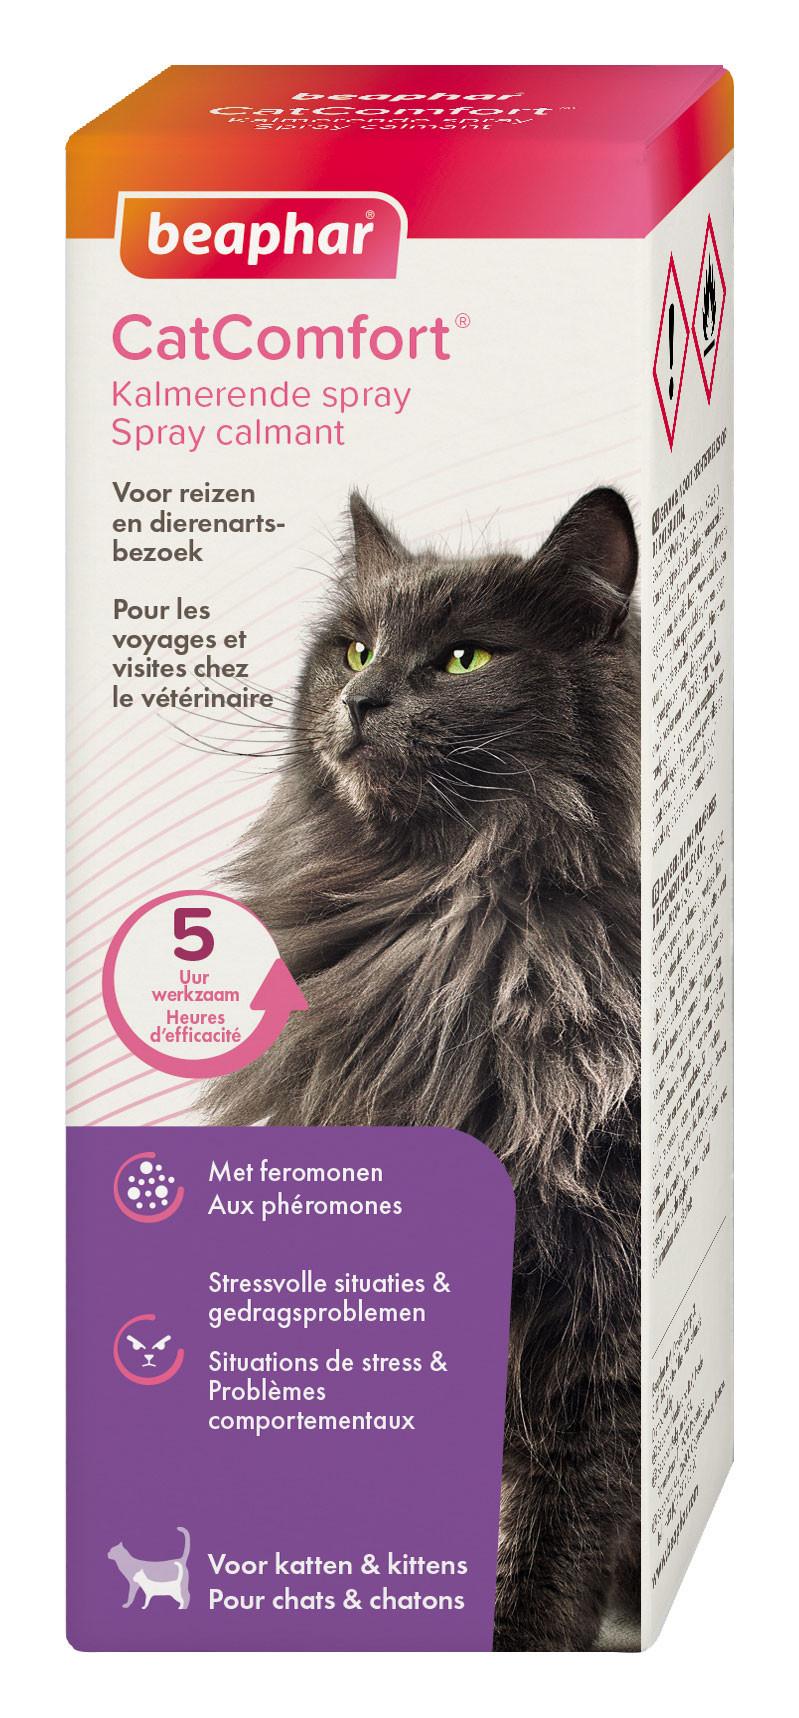 Beaphar CatComfort kalmerende spray 60 ml